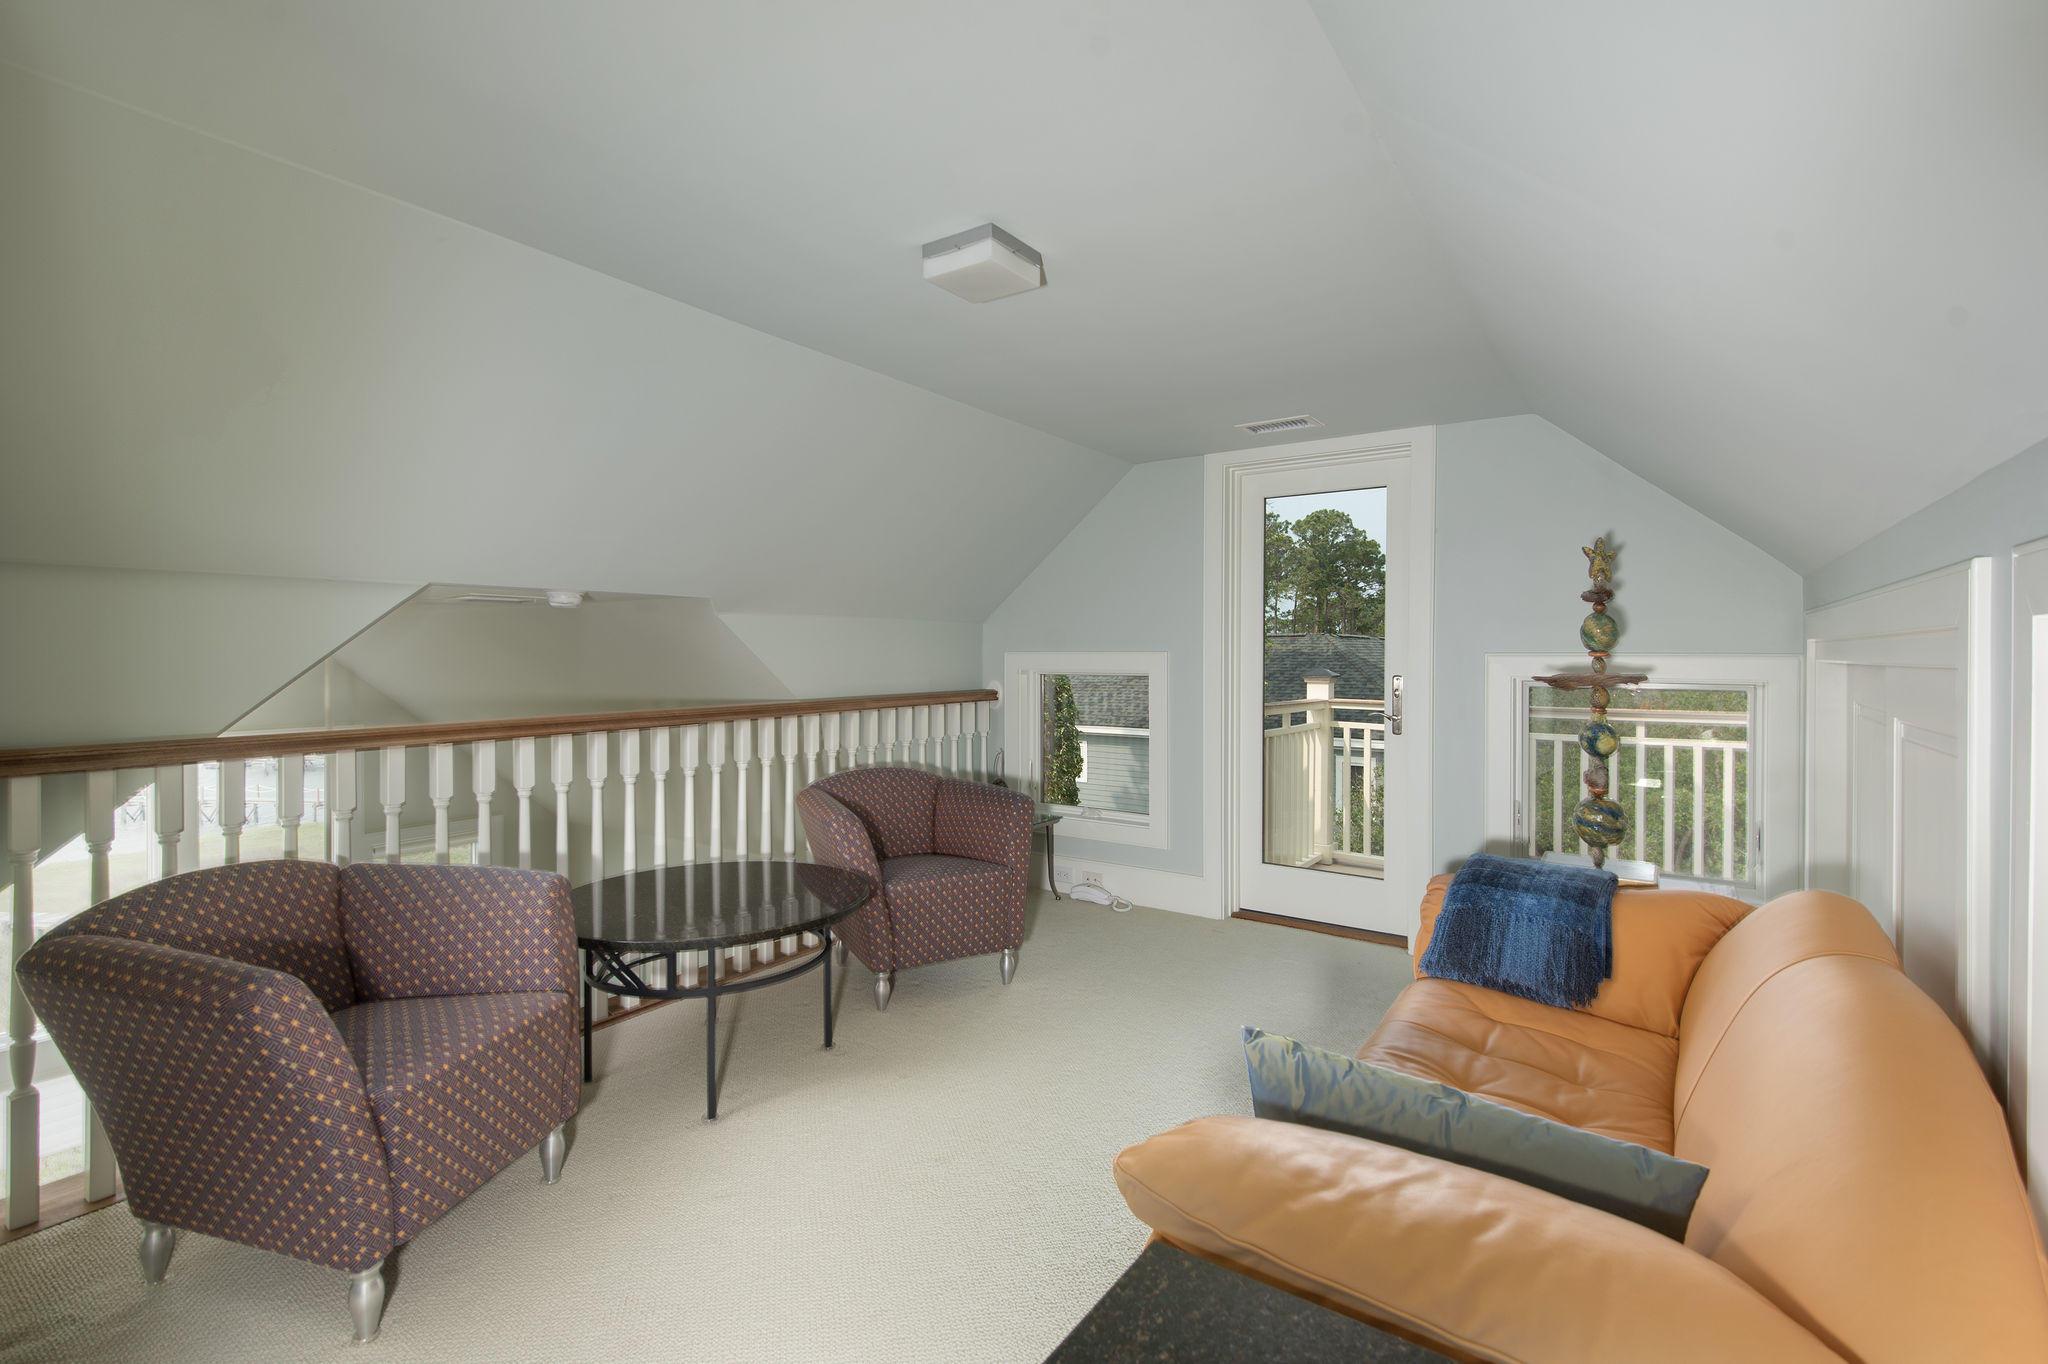 Seabrook Island Homes For Sale - 3135 Marshgate, Seabrook Island, SC - 35